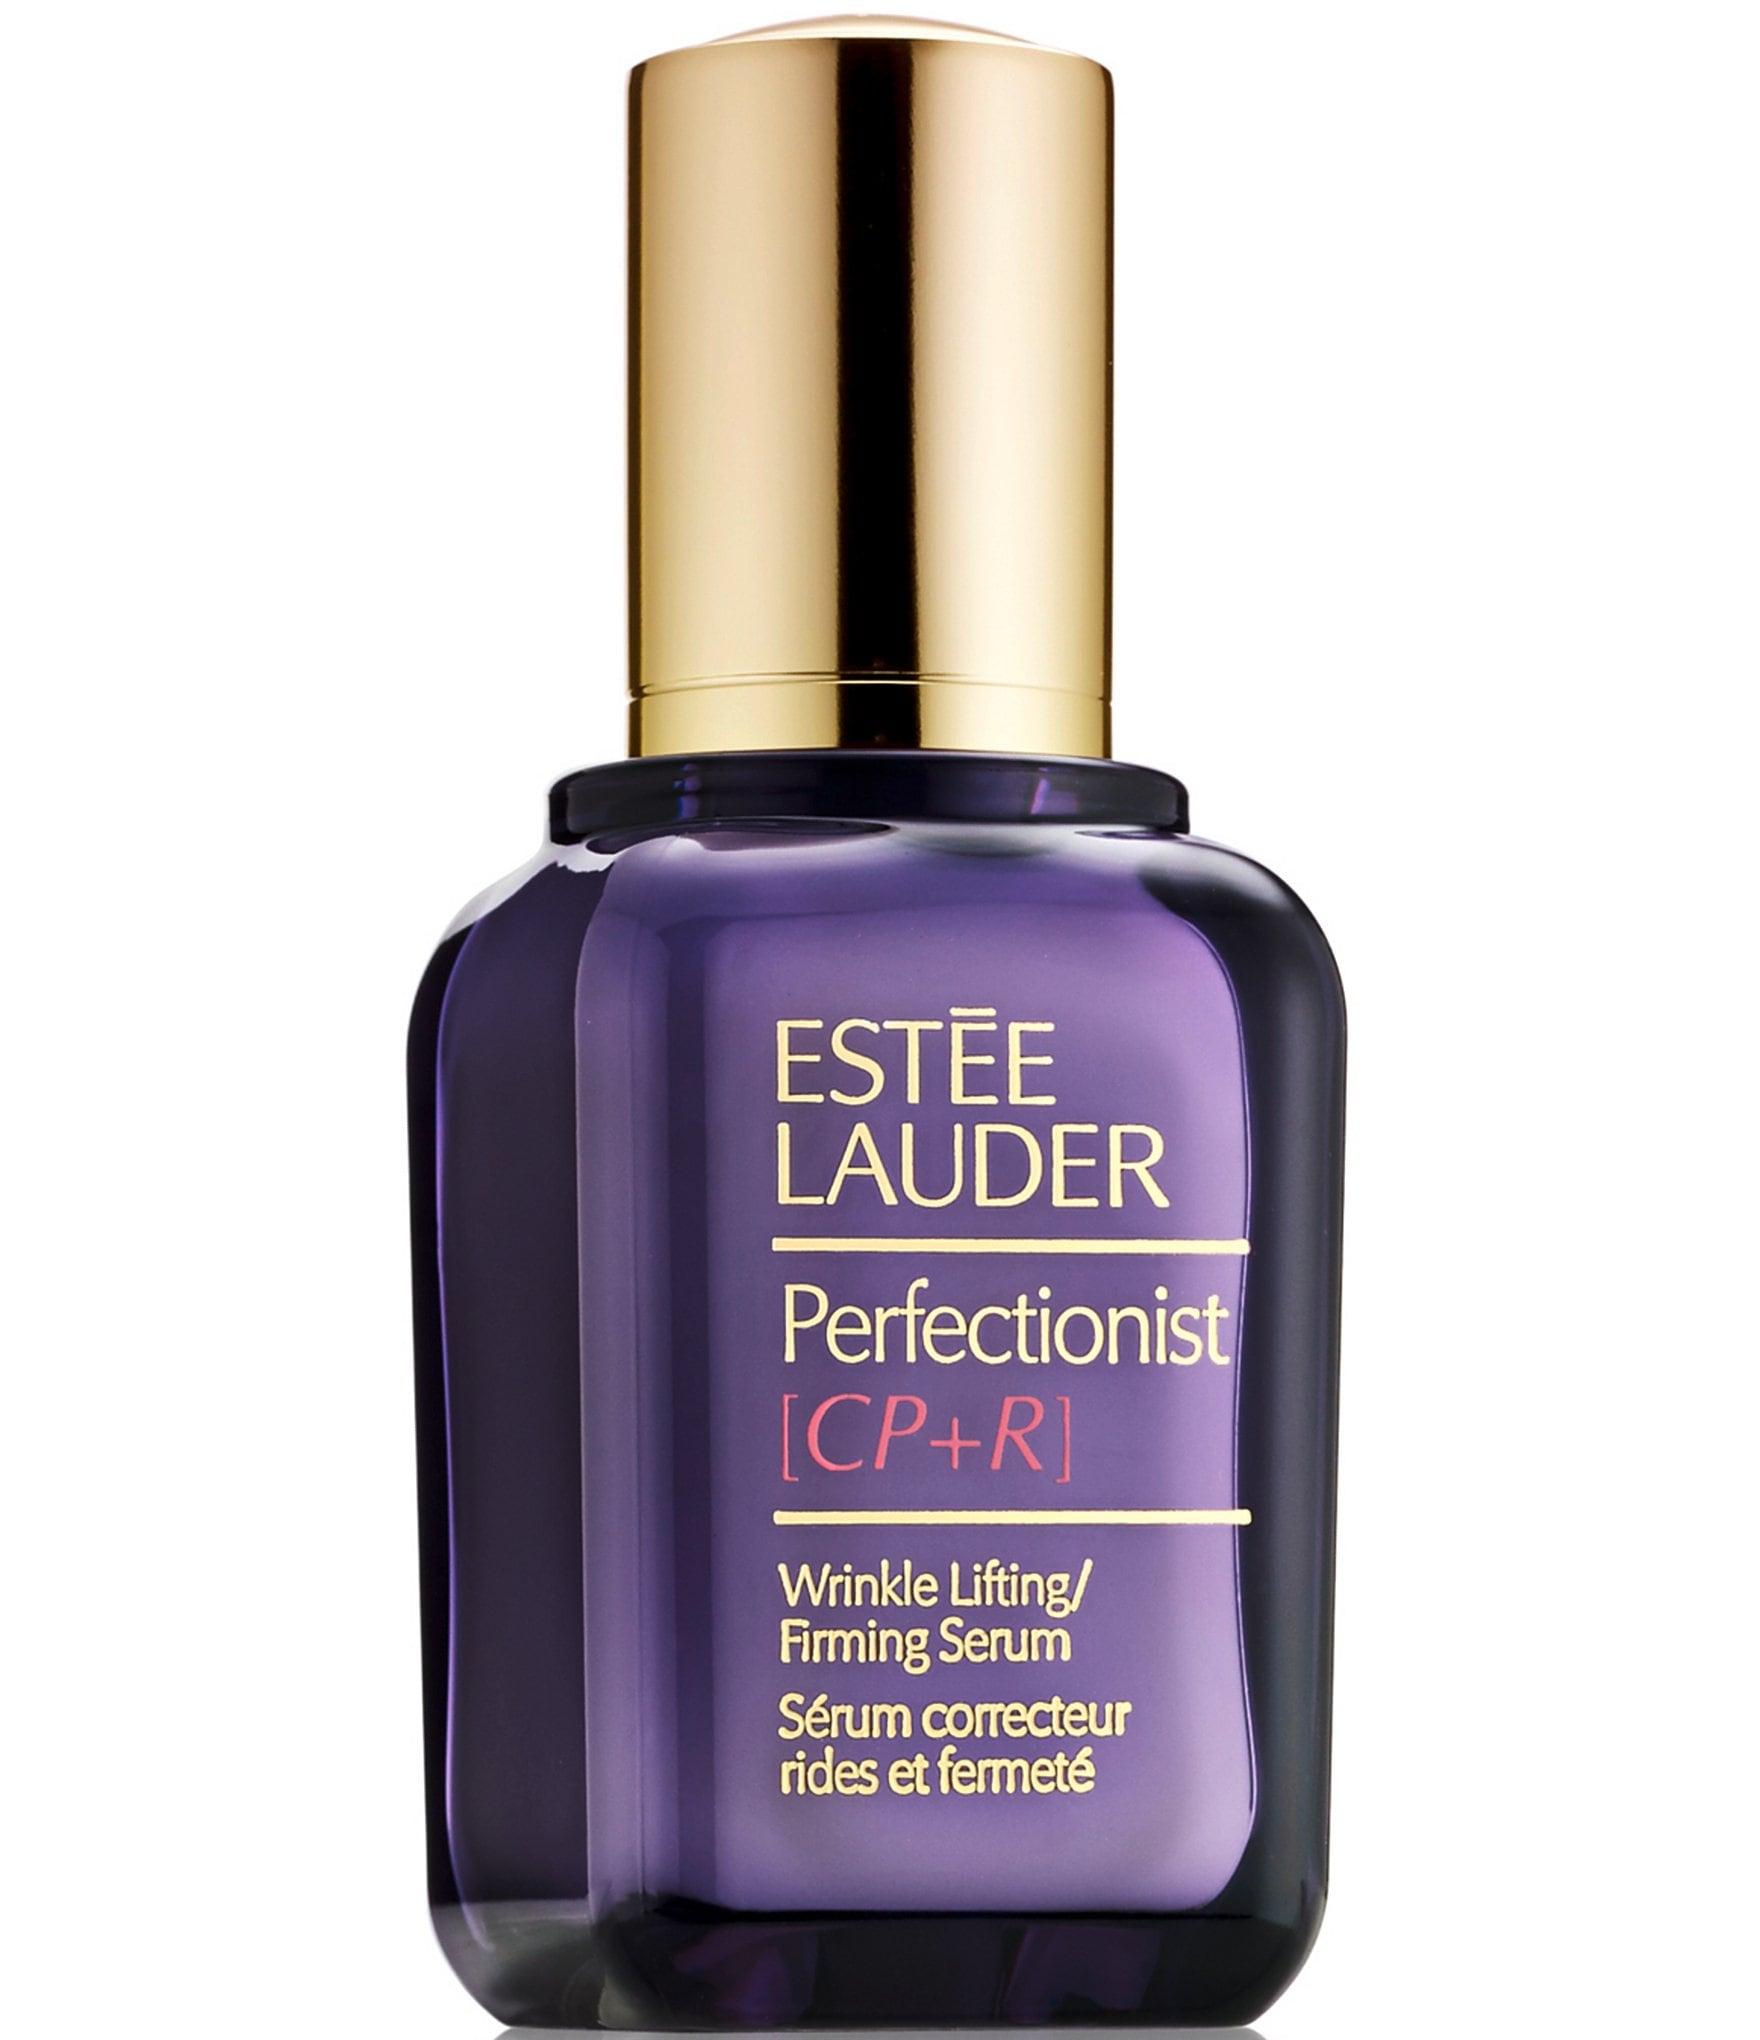 Estee Lauder | Dillards.com